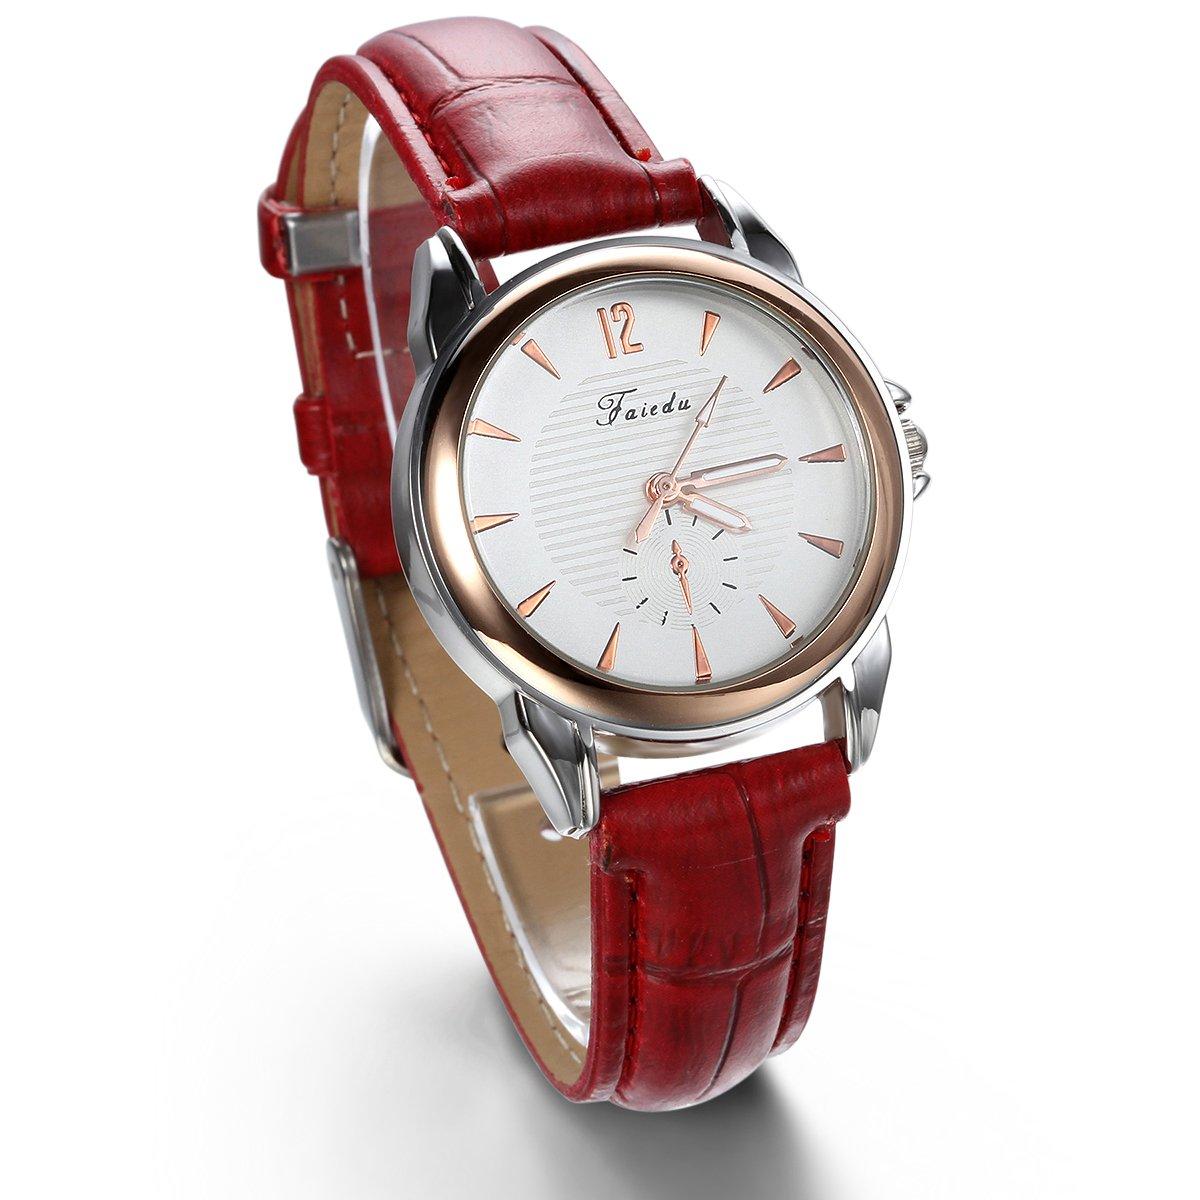 JewelryWe-Damen-Armbanduhr-Analog-Quarz-Klassische-Business-Casual-Uhr-mit-Leder-Armband-Rot